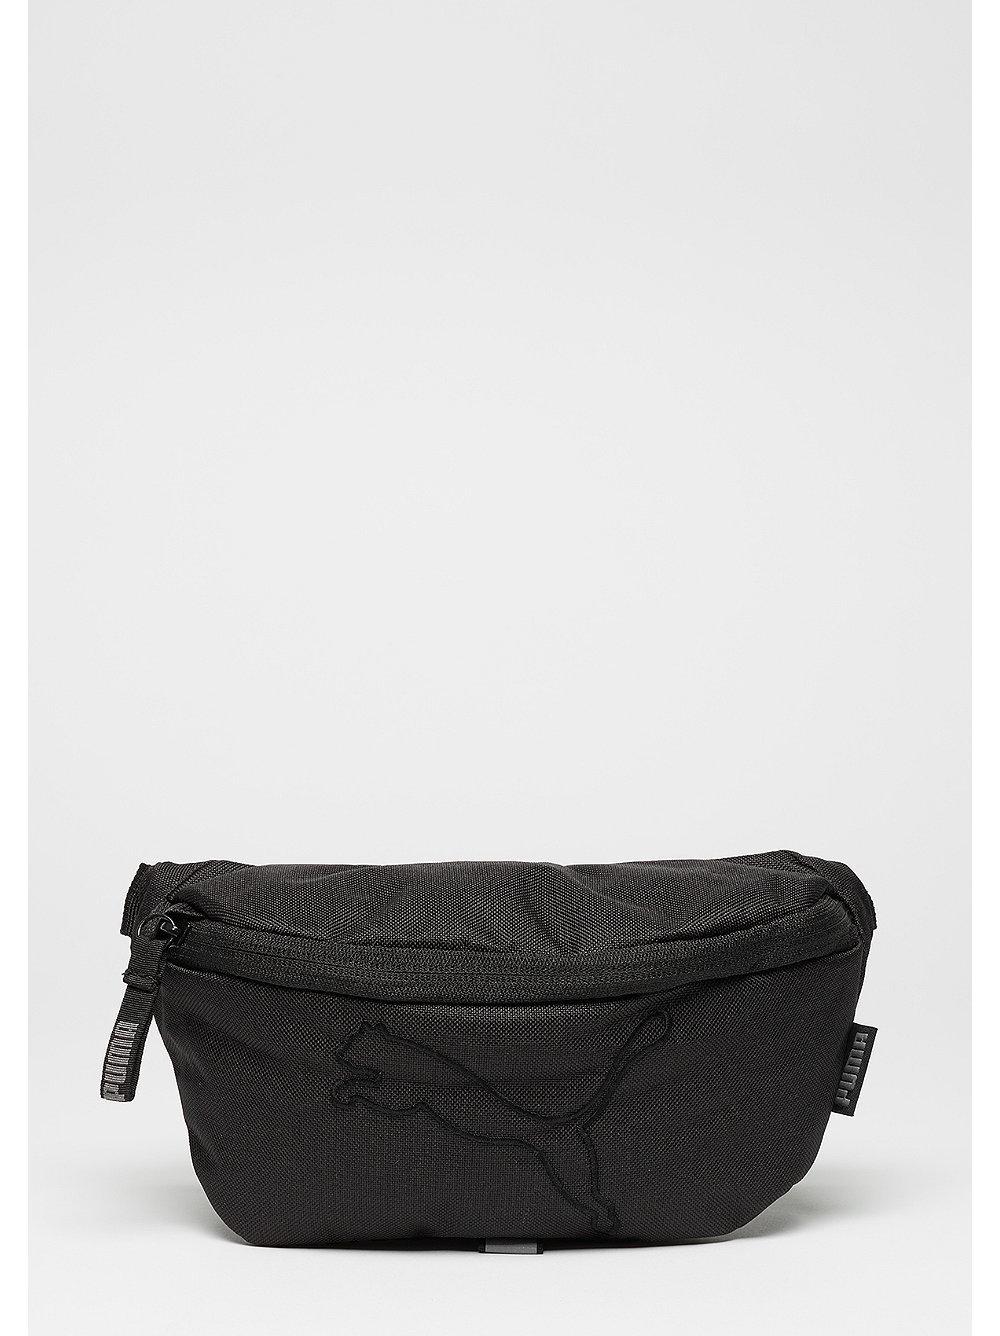 Hipbag Buzz Waist Bag black